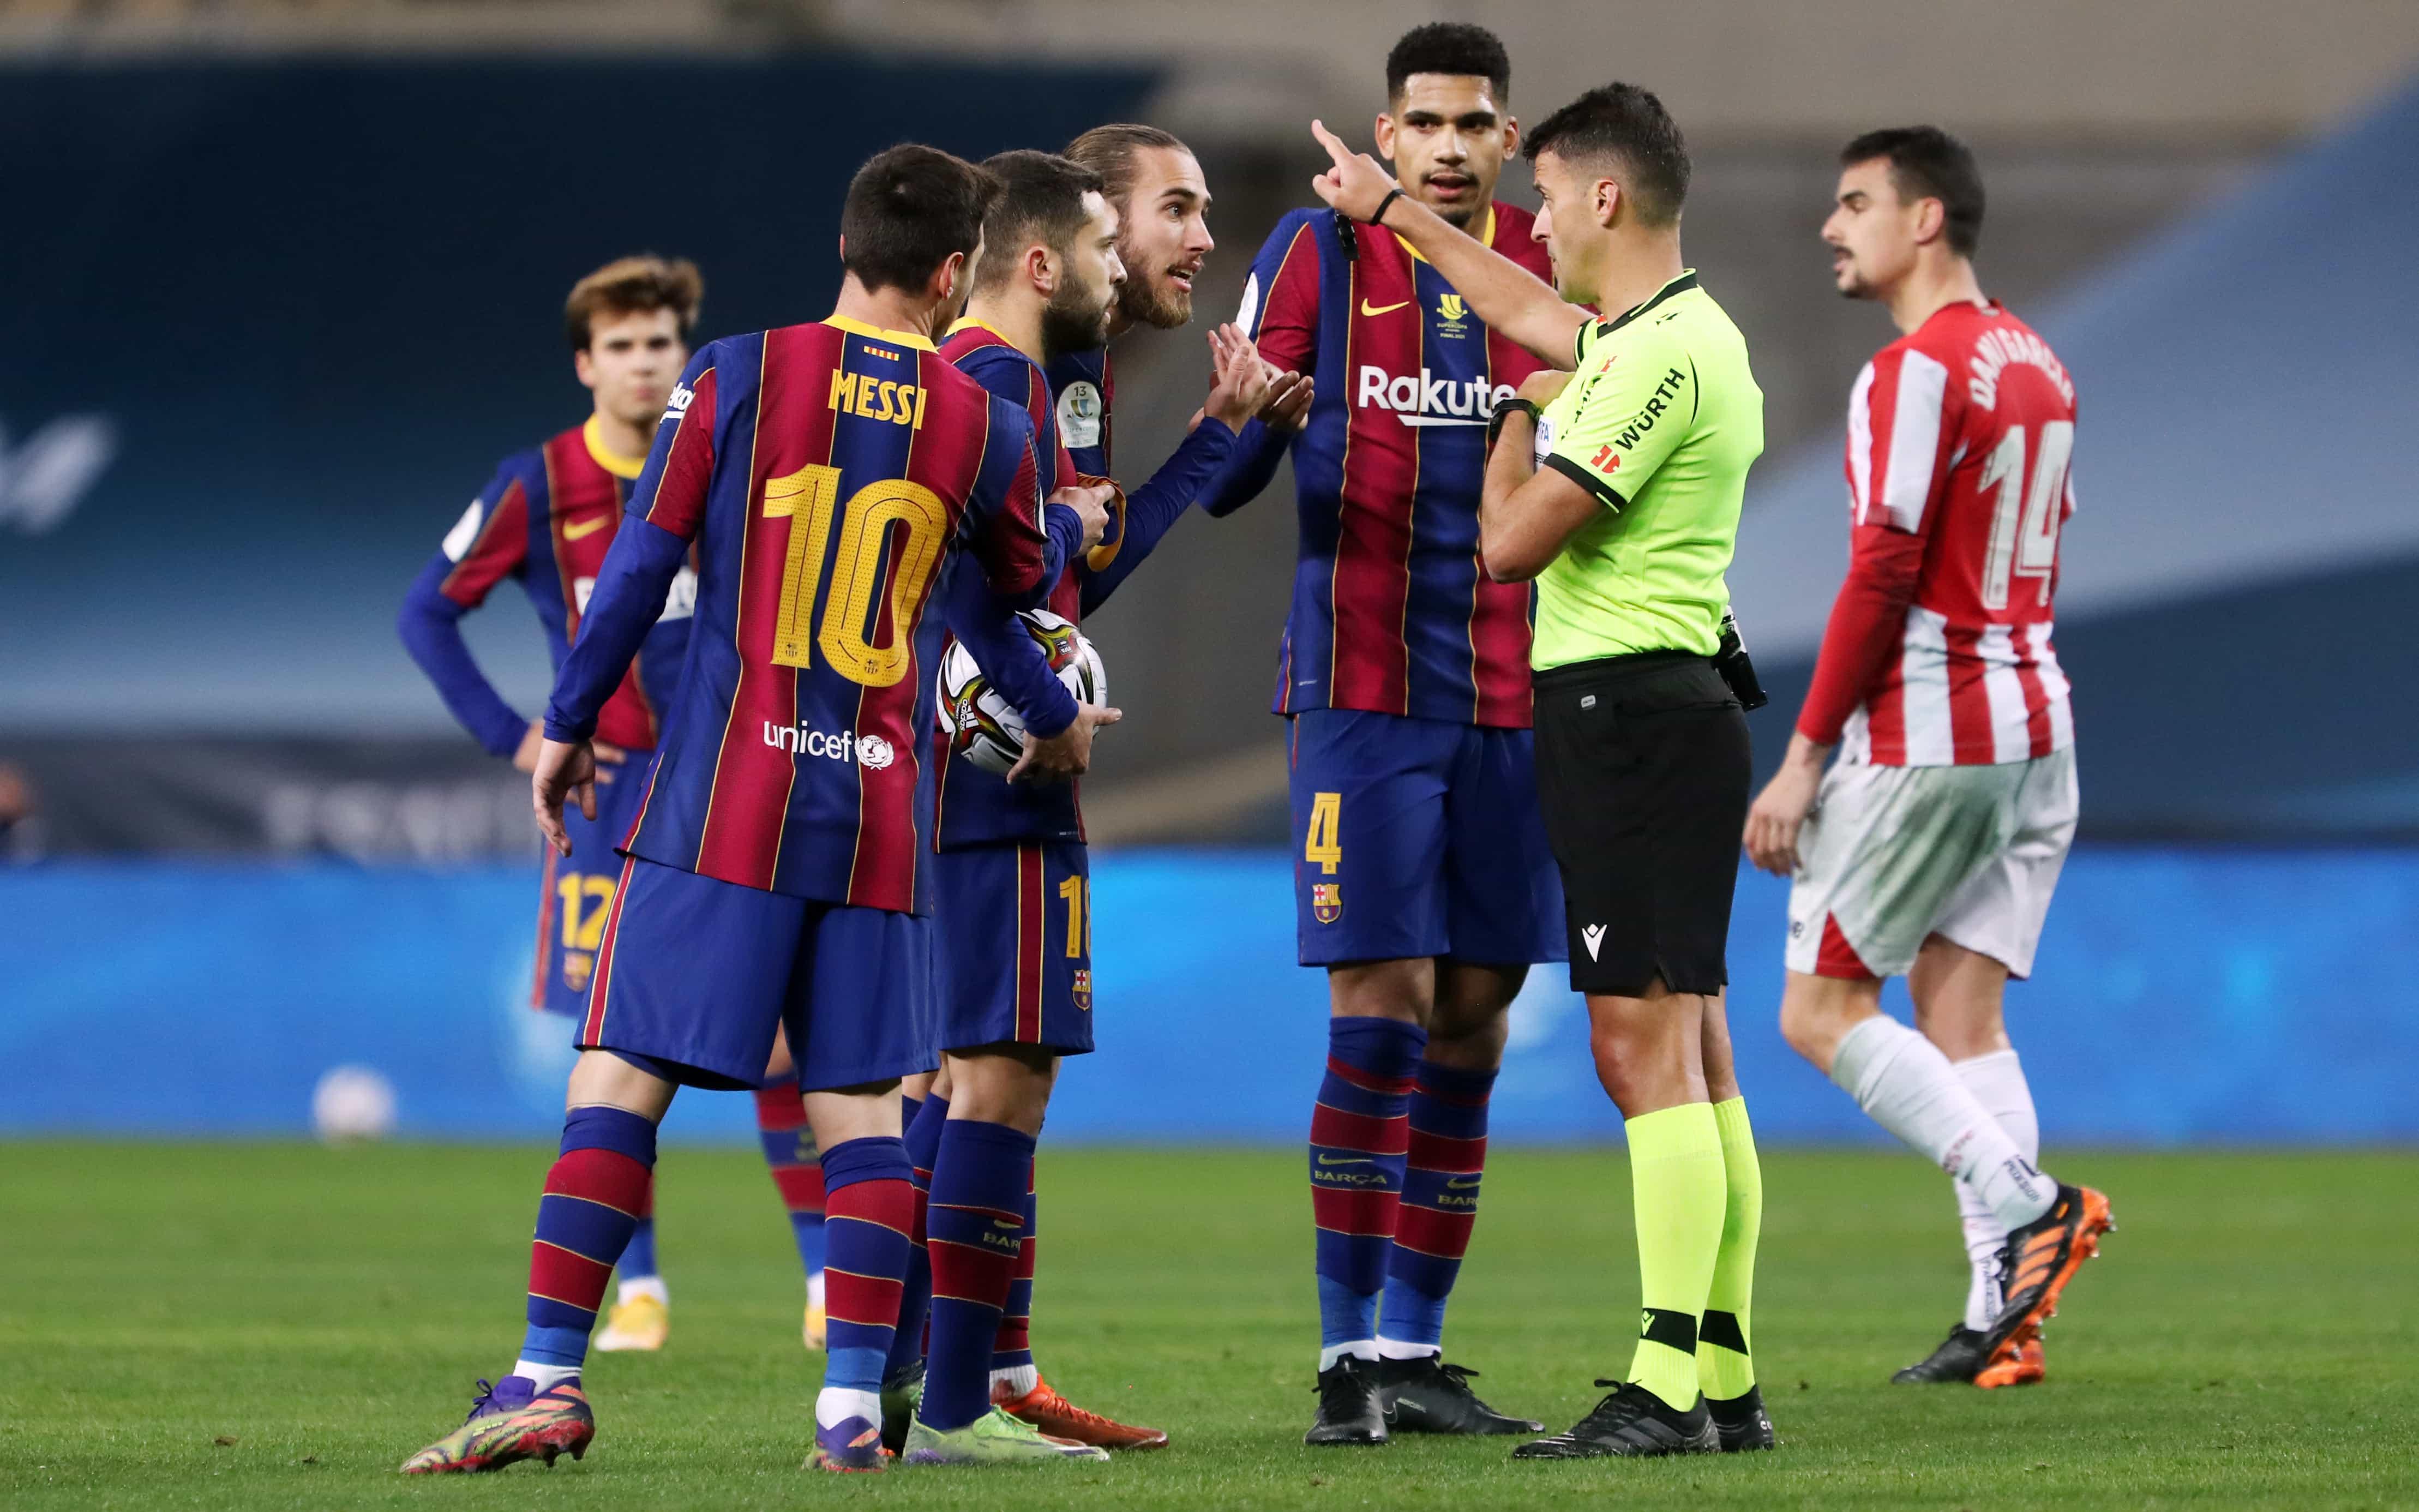 FC Barcelona to appeal Messi suspension - FC Barcelona